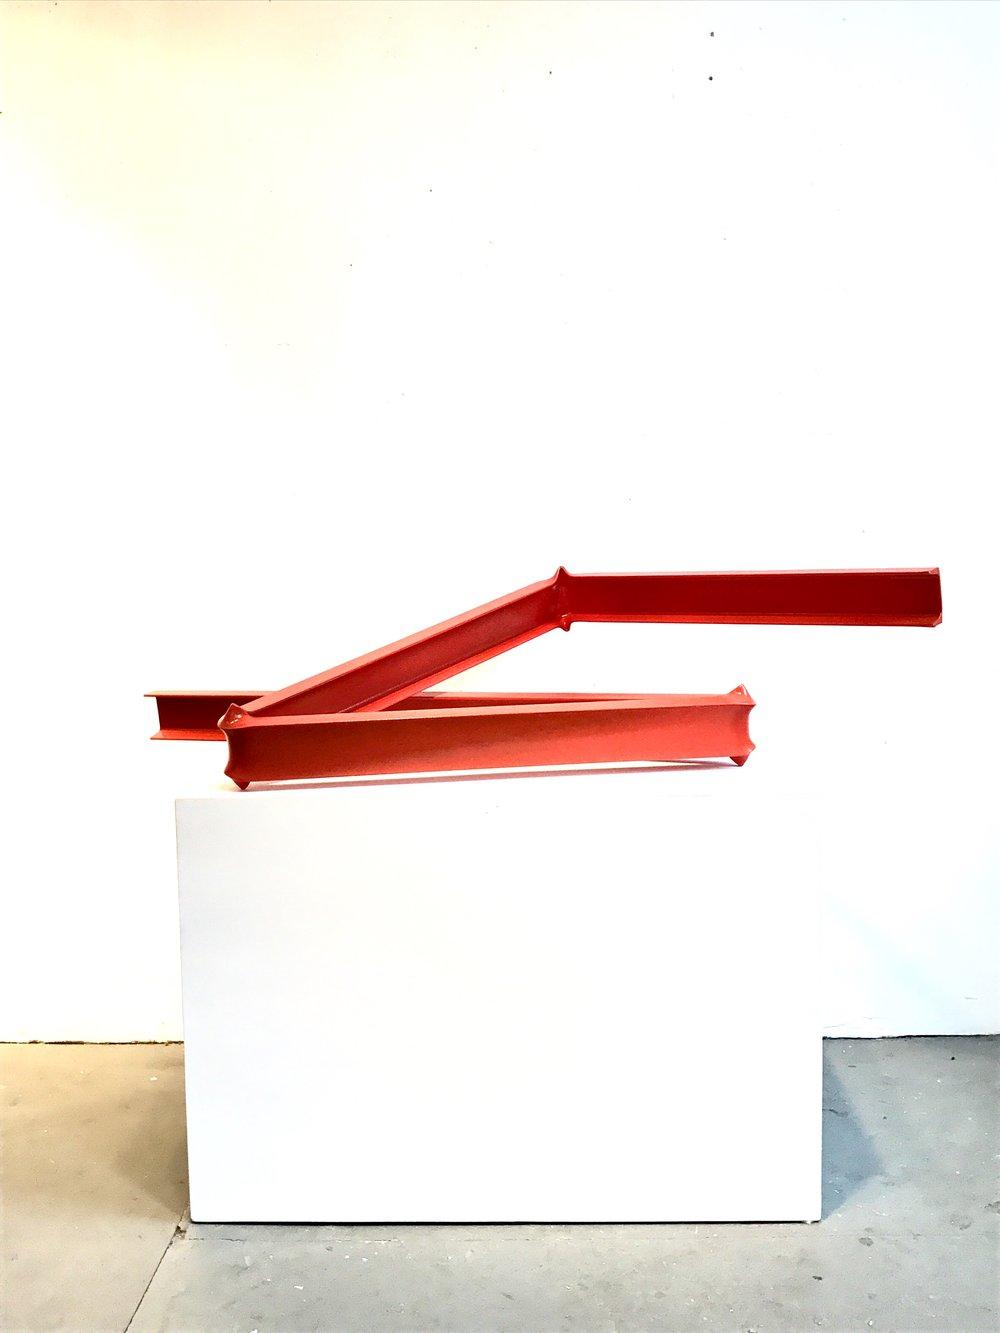 Powder coated bent steel. 4' x 2' x 1' $1800